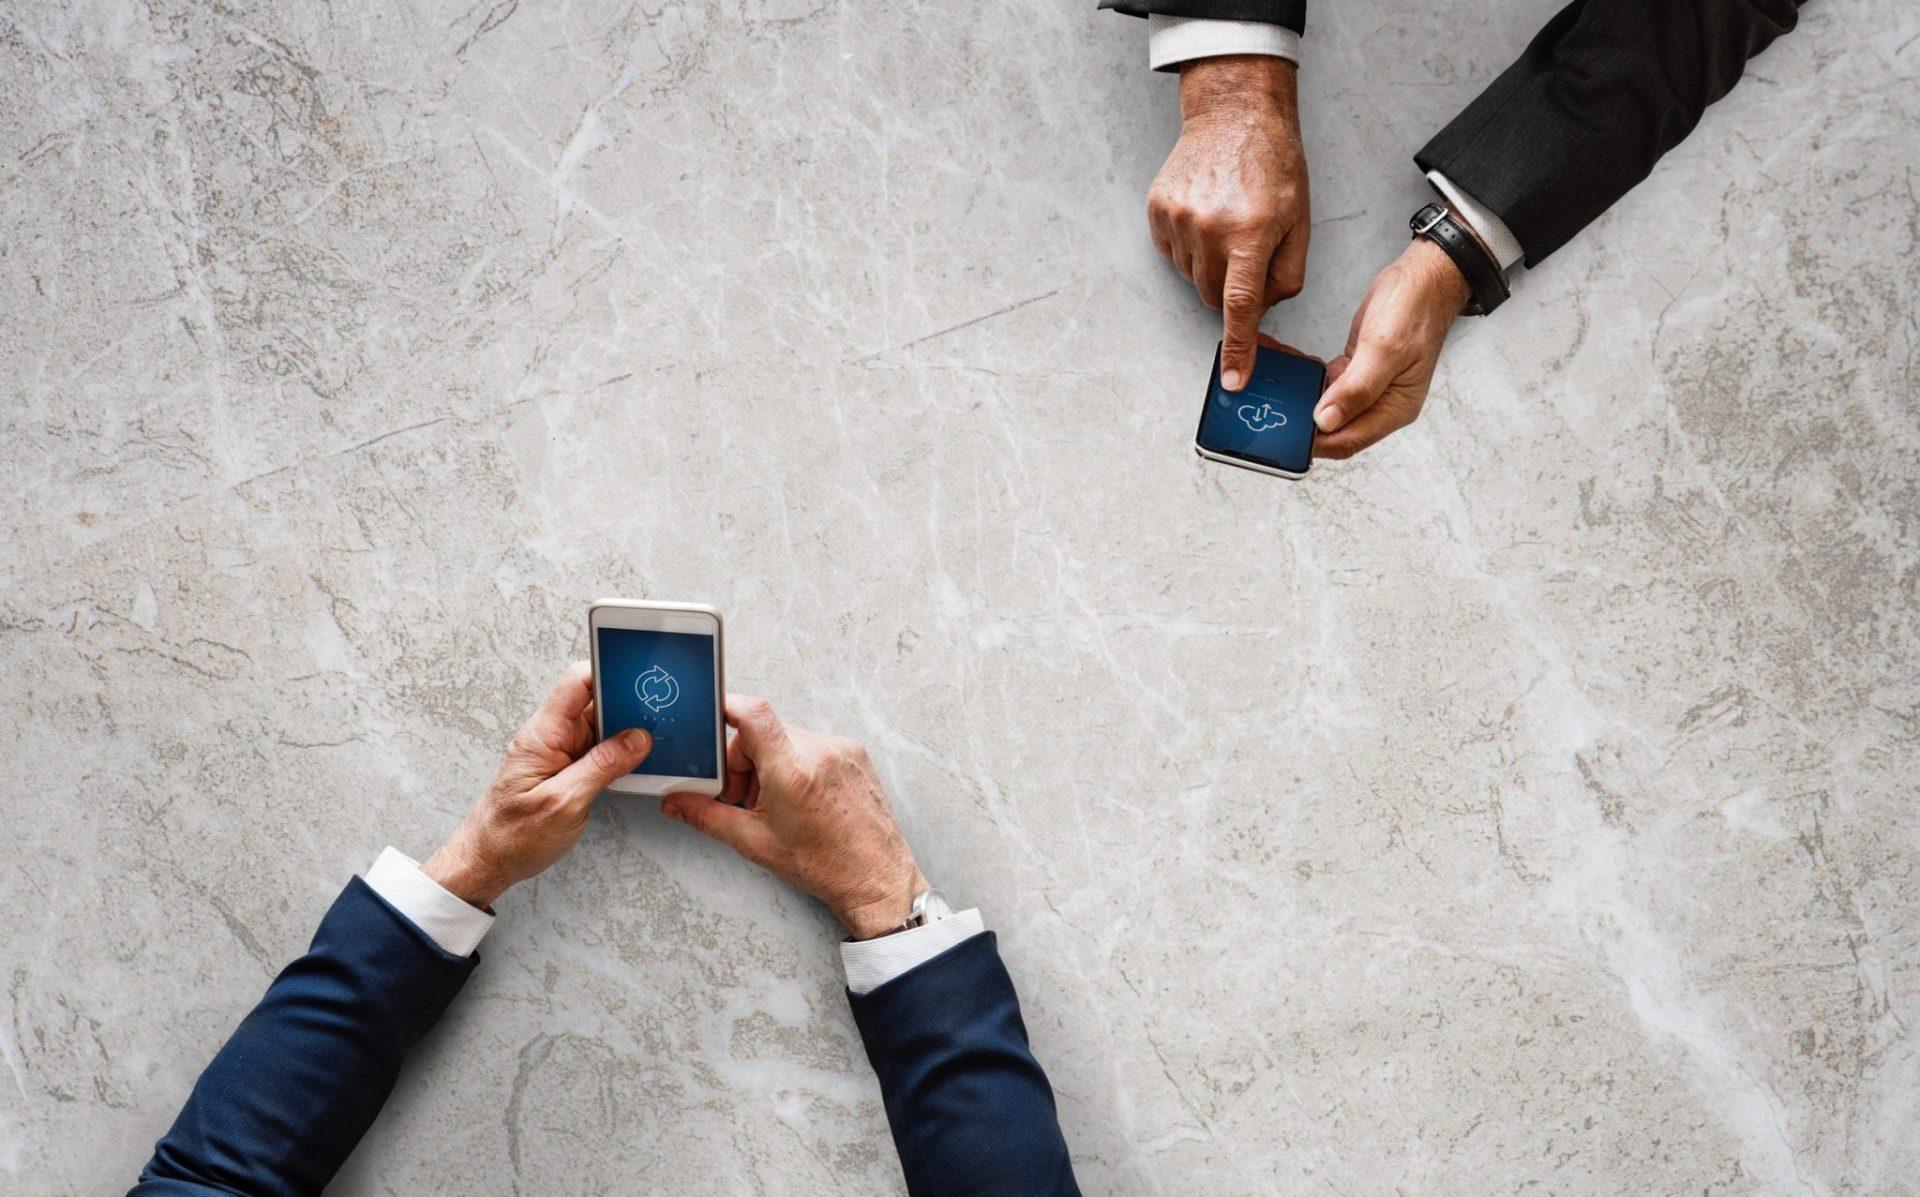 global smartphone market declined yoy for second successive quarter